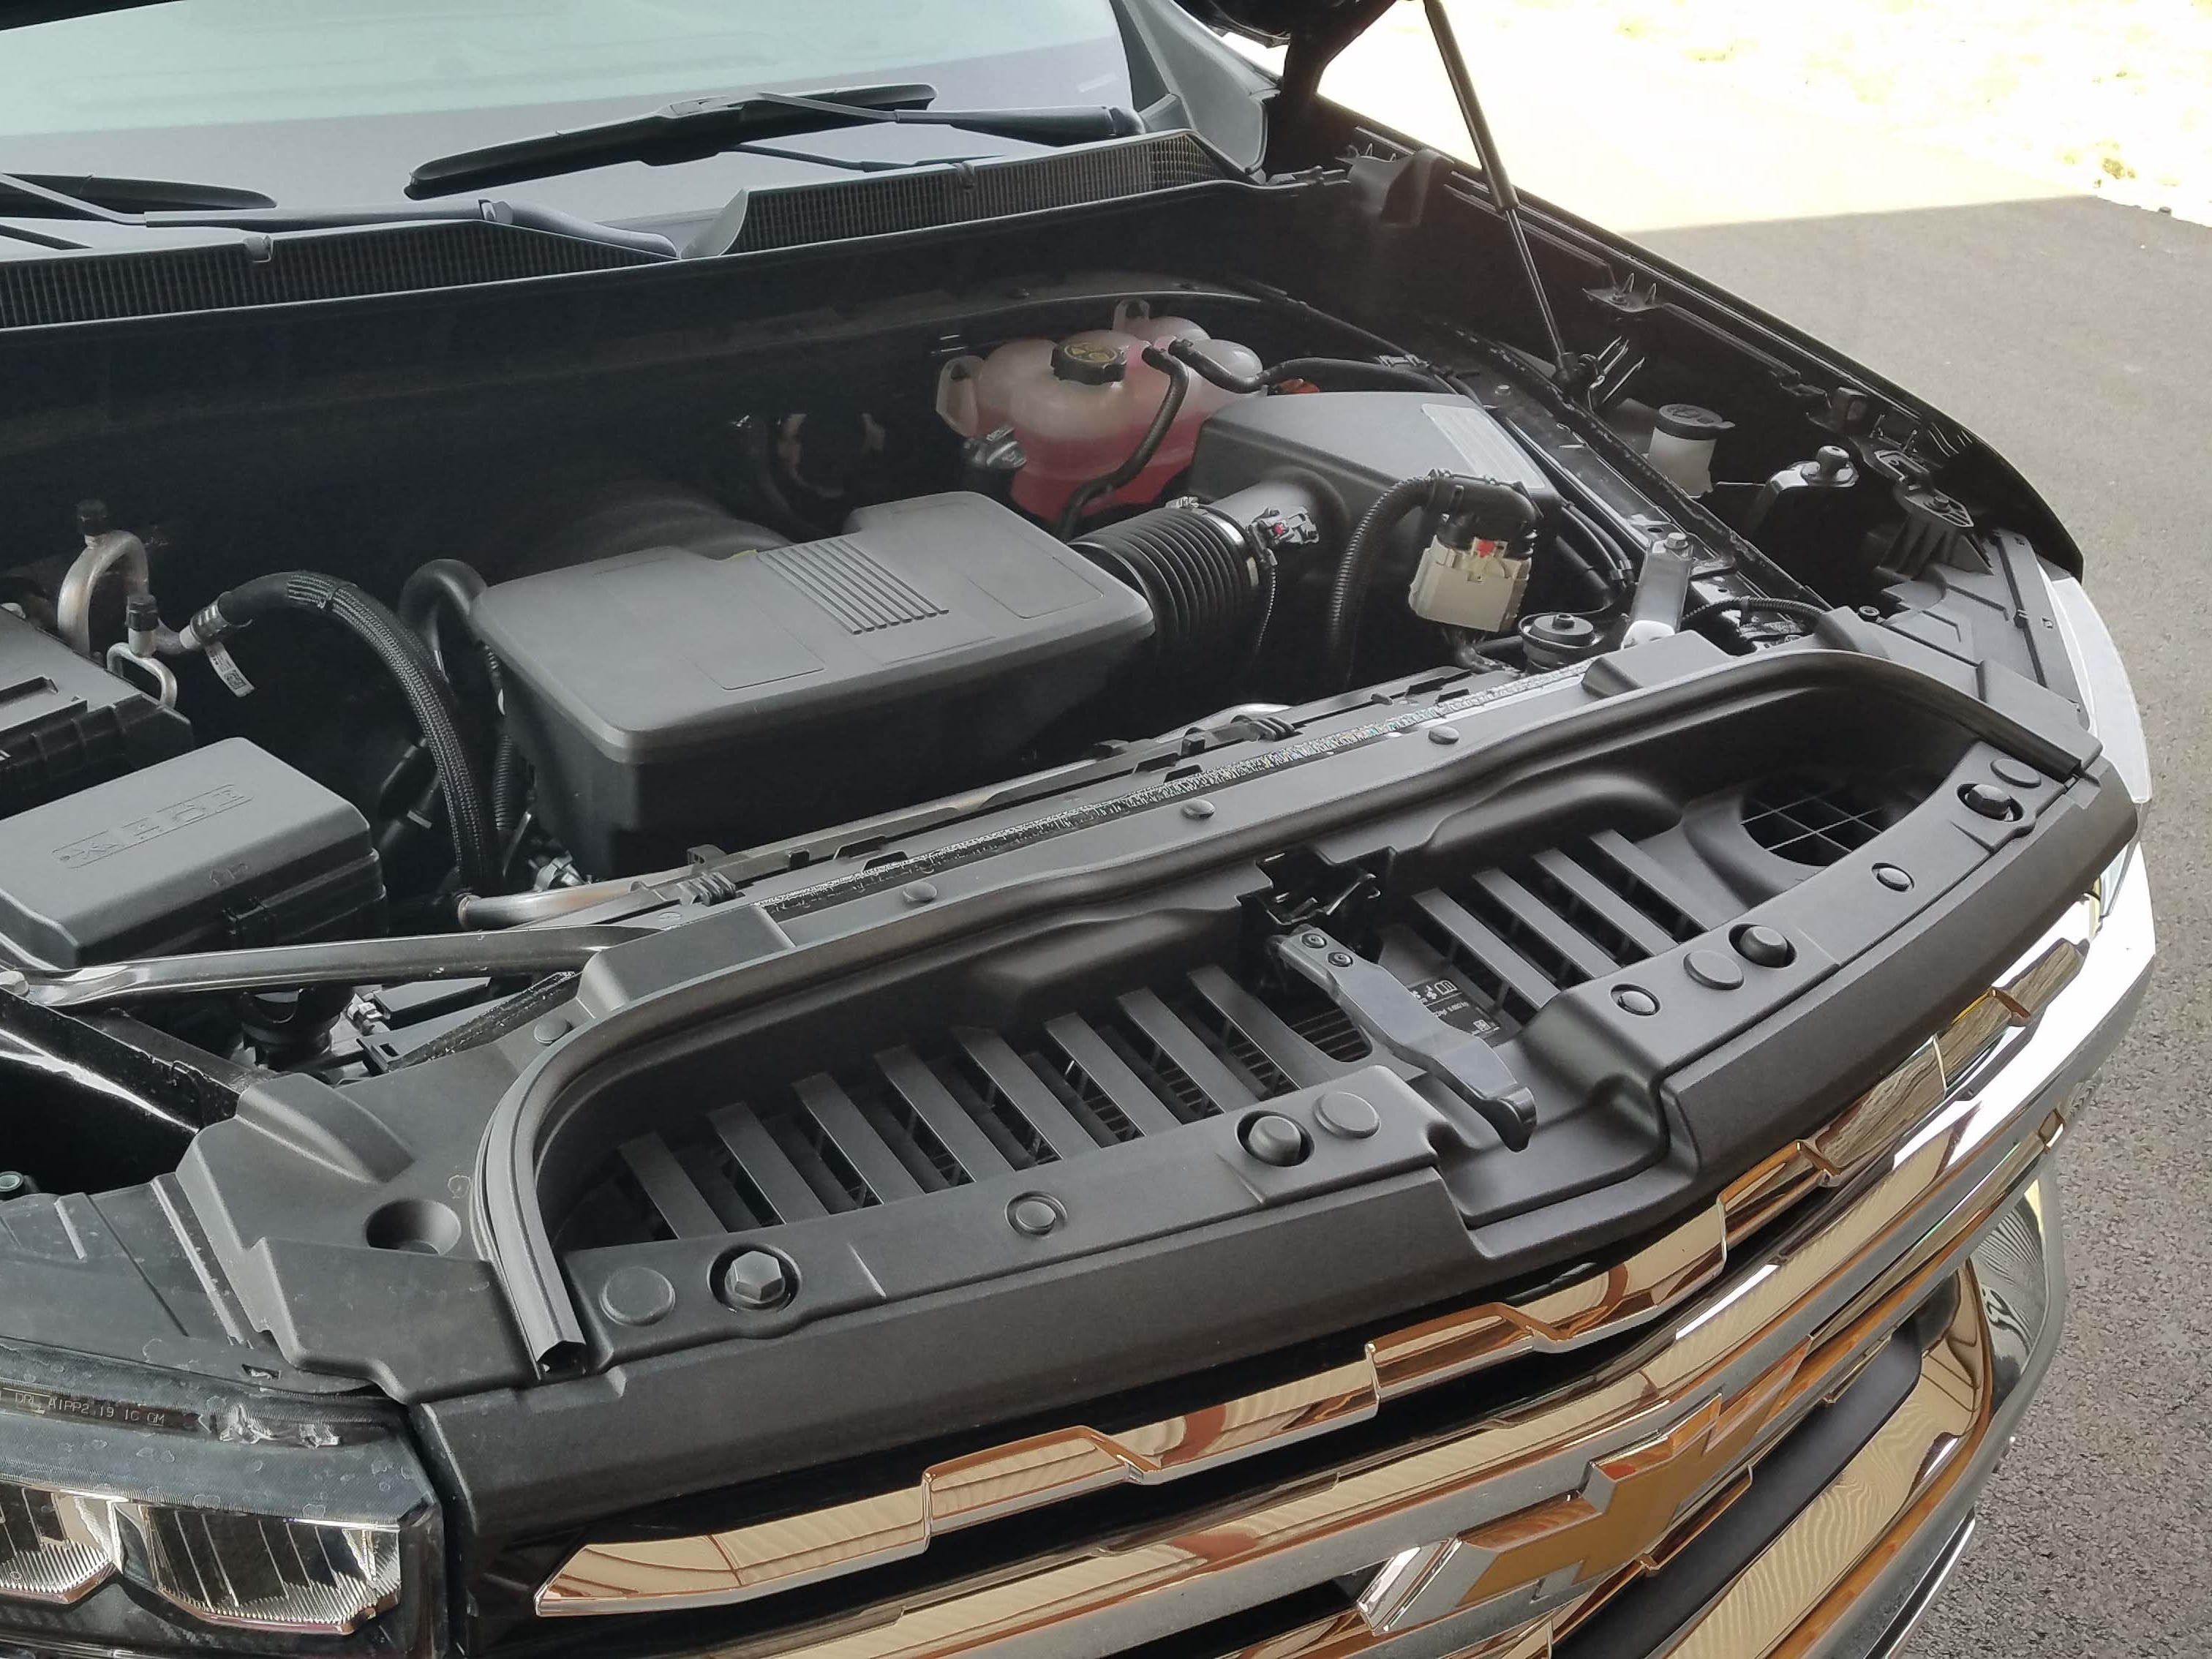 The 2019 Chevy Silverado comes with a range of engines including a 6.2-liter V-8 (shown here), 5.3-liter V-8, 4.6-liter V-6, 2.7-liter turbo-4, and 3.0-liter diesel V-6.